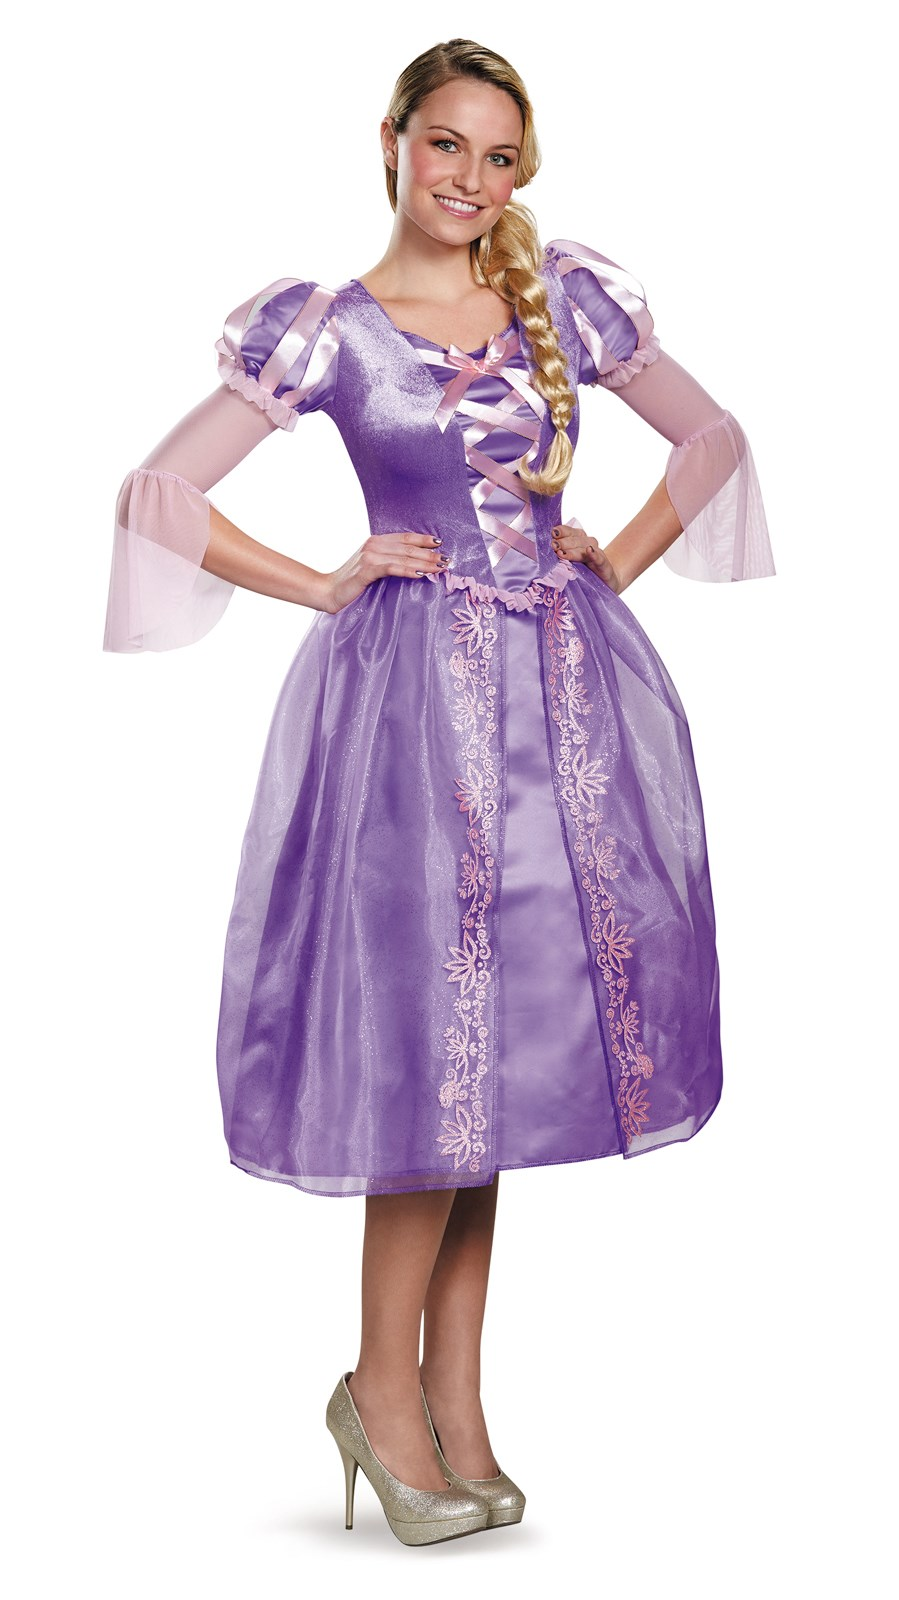 Disney Princess Costumes | BuyCostumes.com